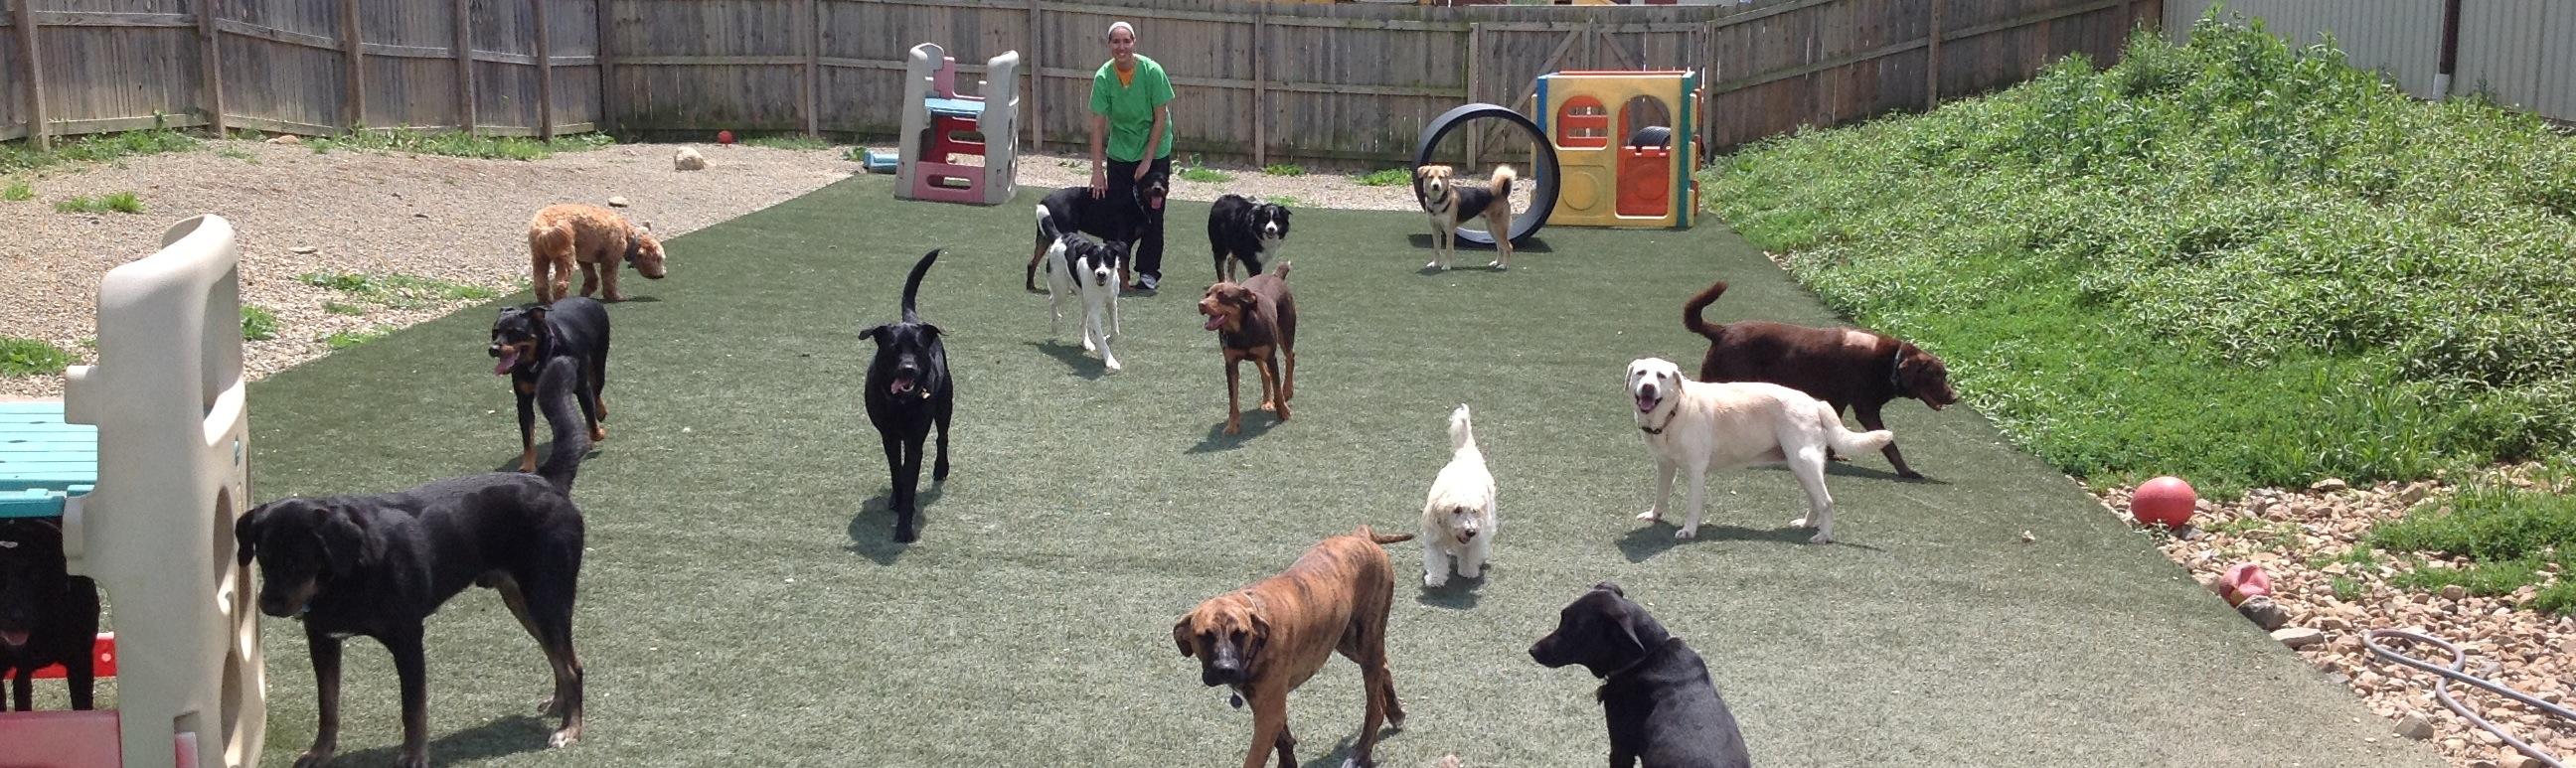 Dog Boarding Kennels Akron Ohio